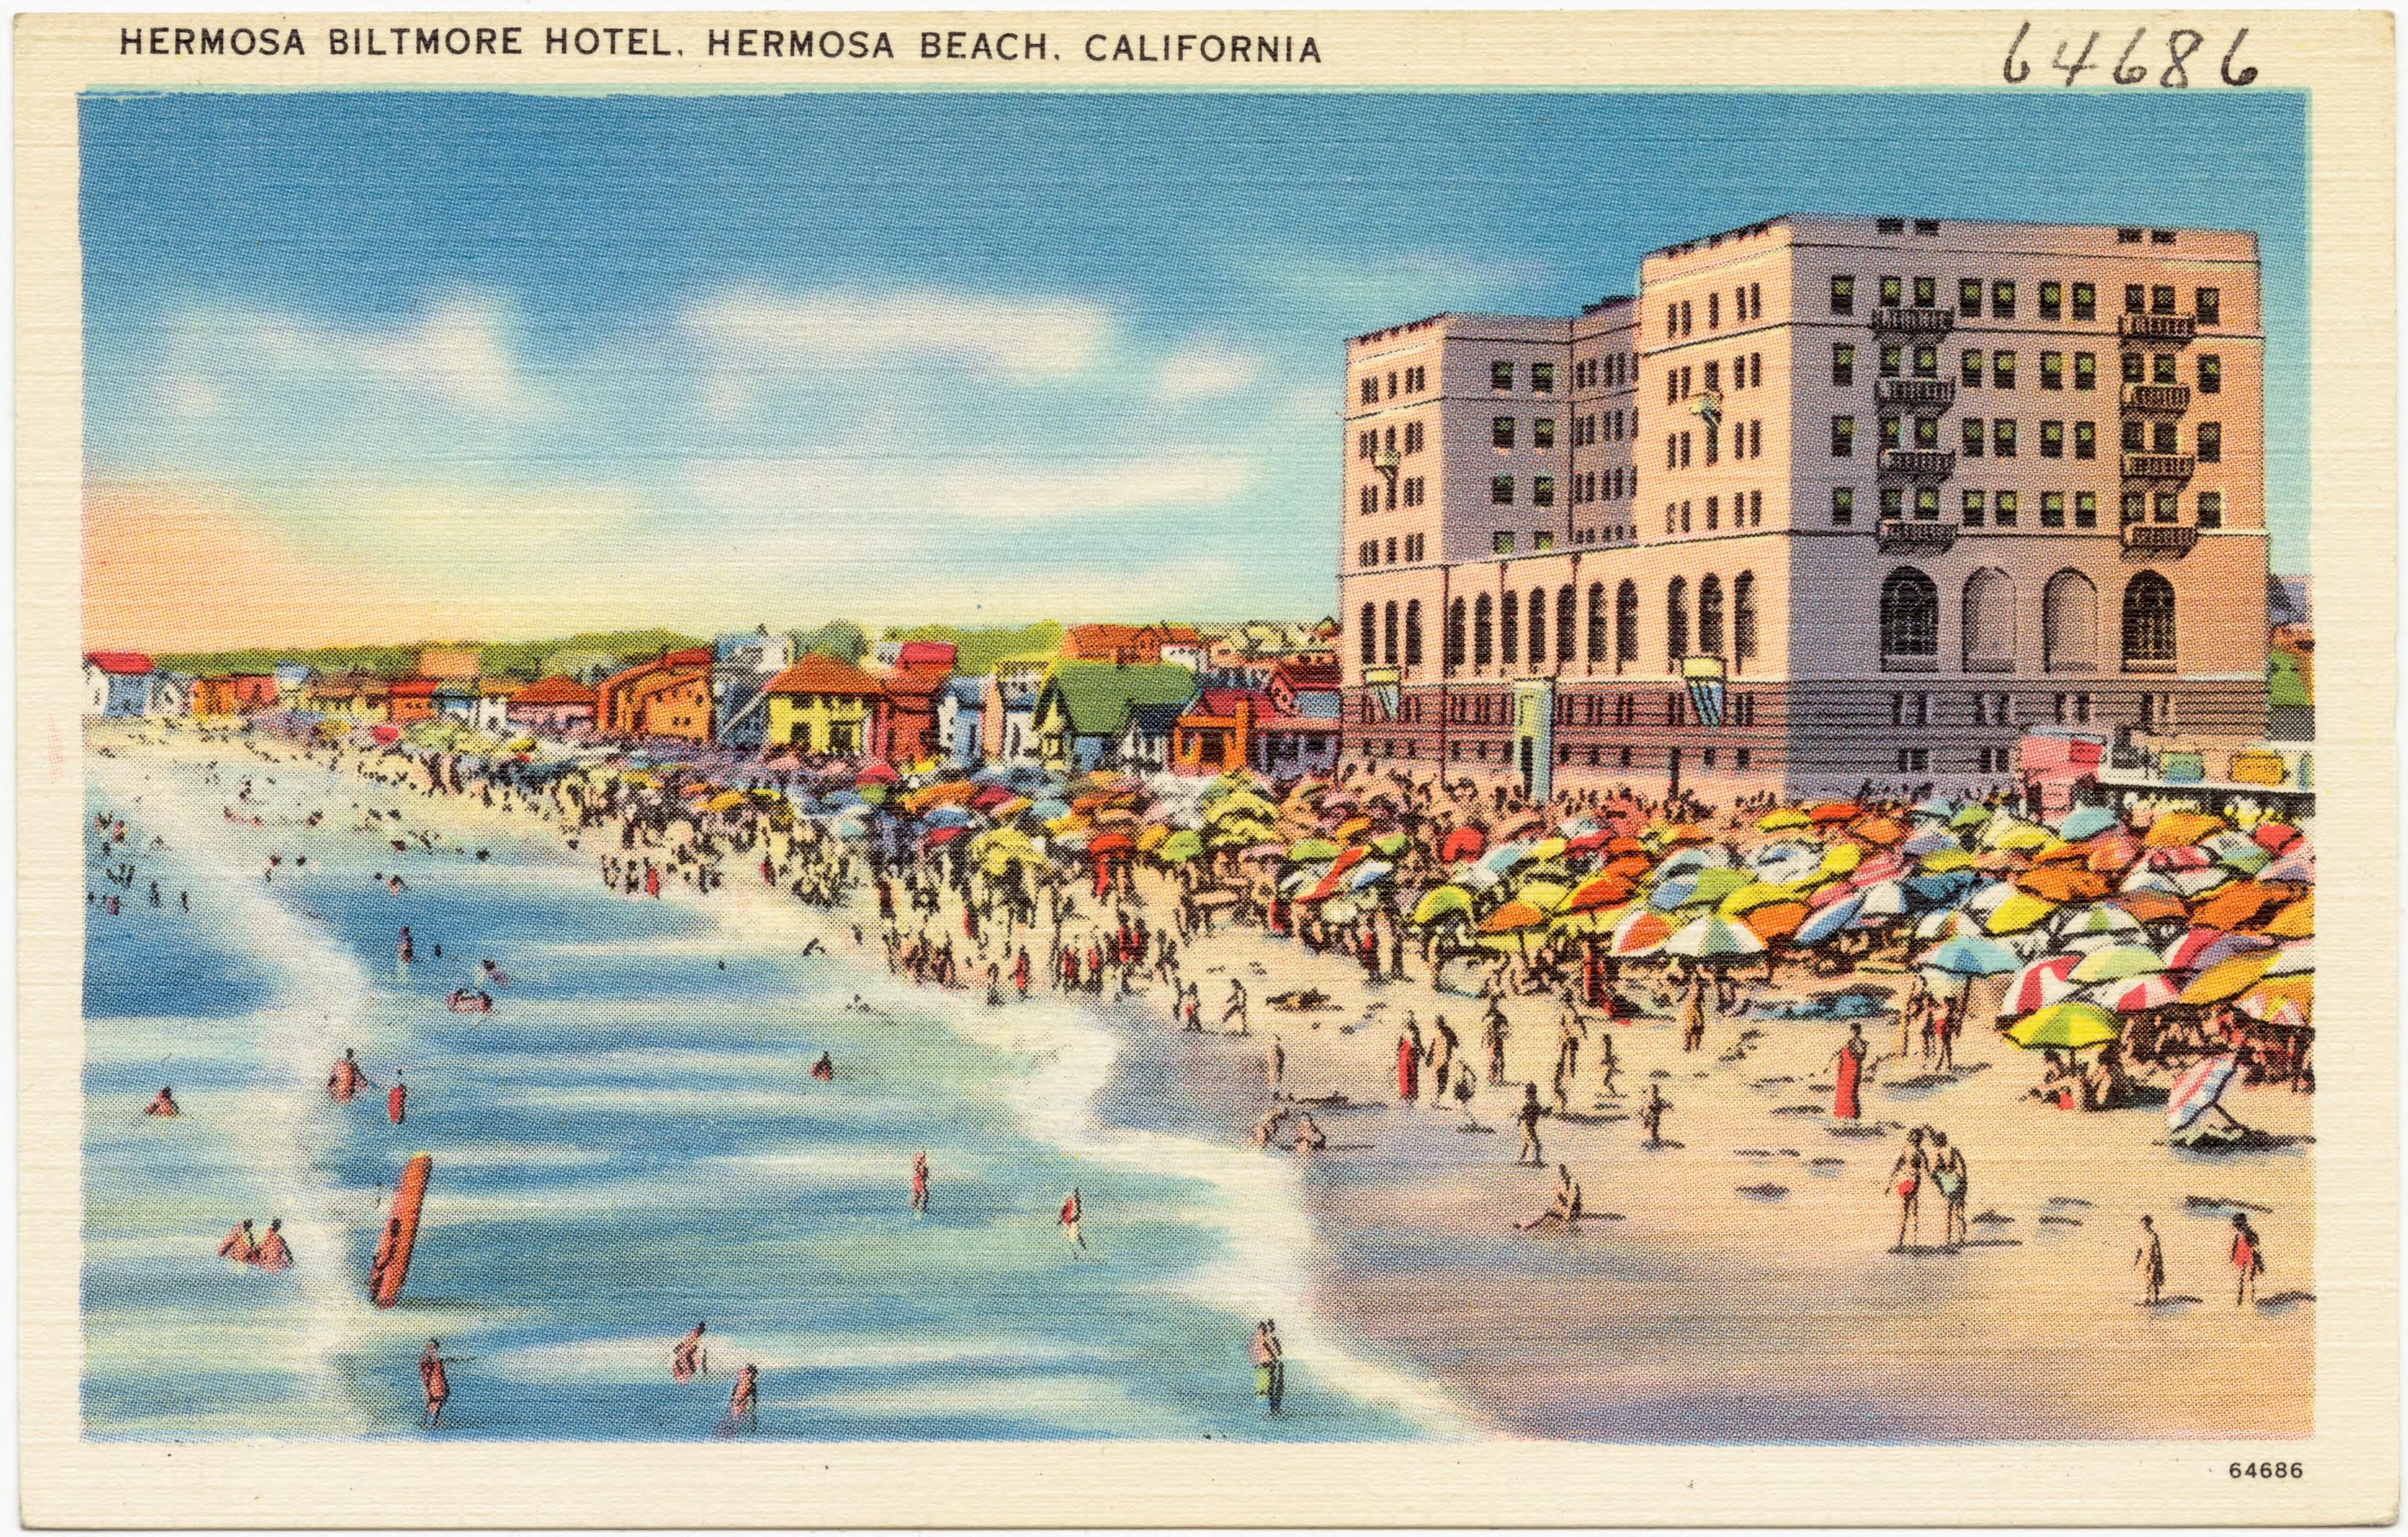 File Hermosa Biltmore Hotel Beach California 64686 Jpg